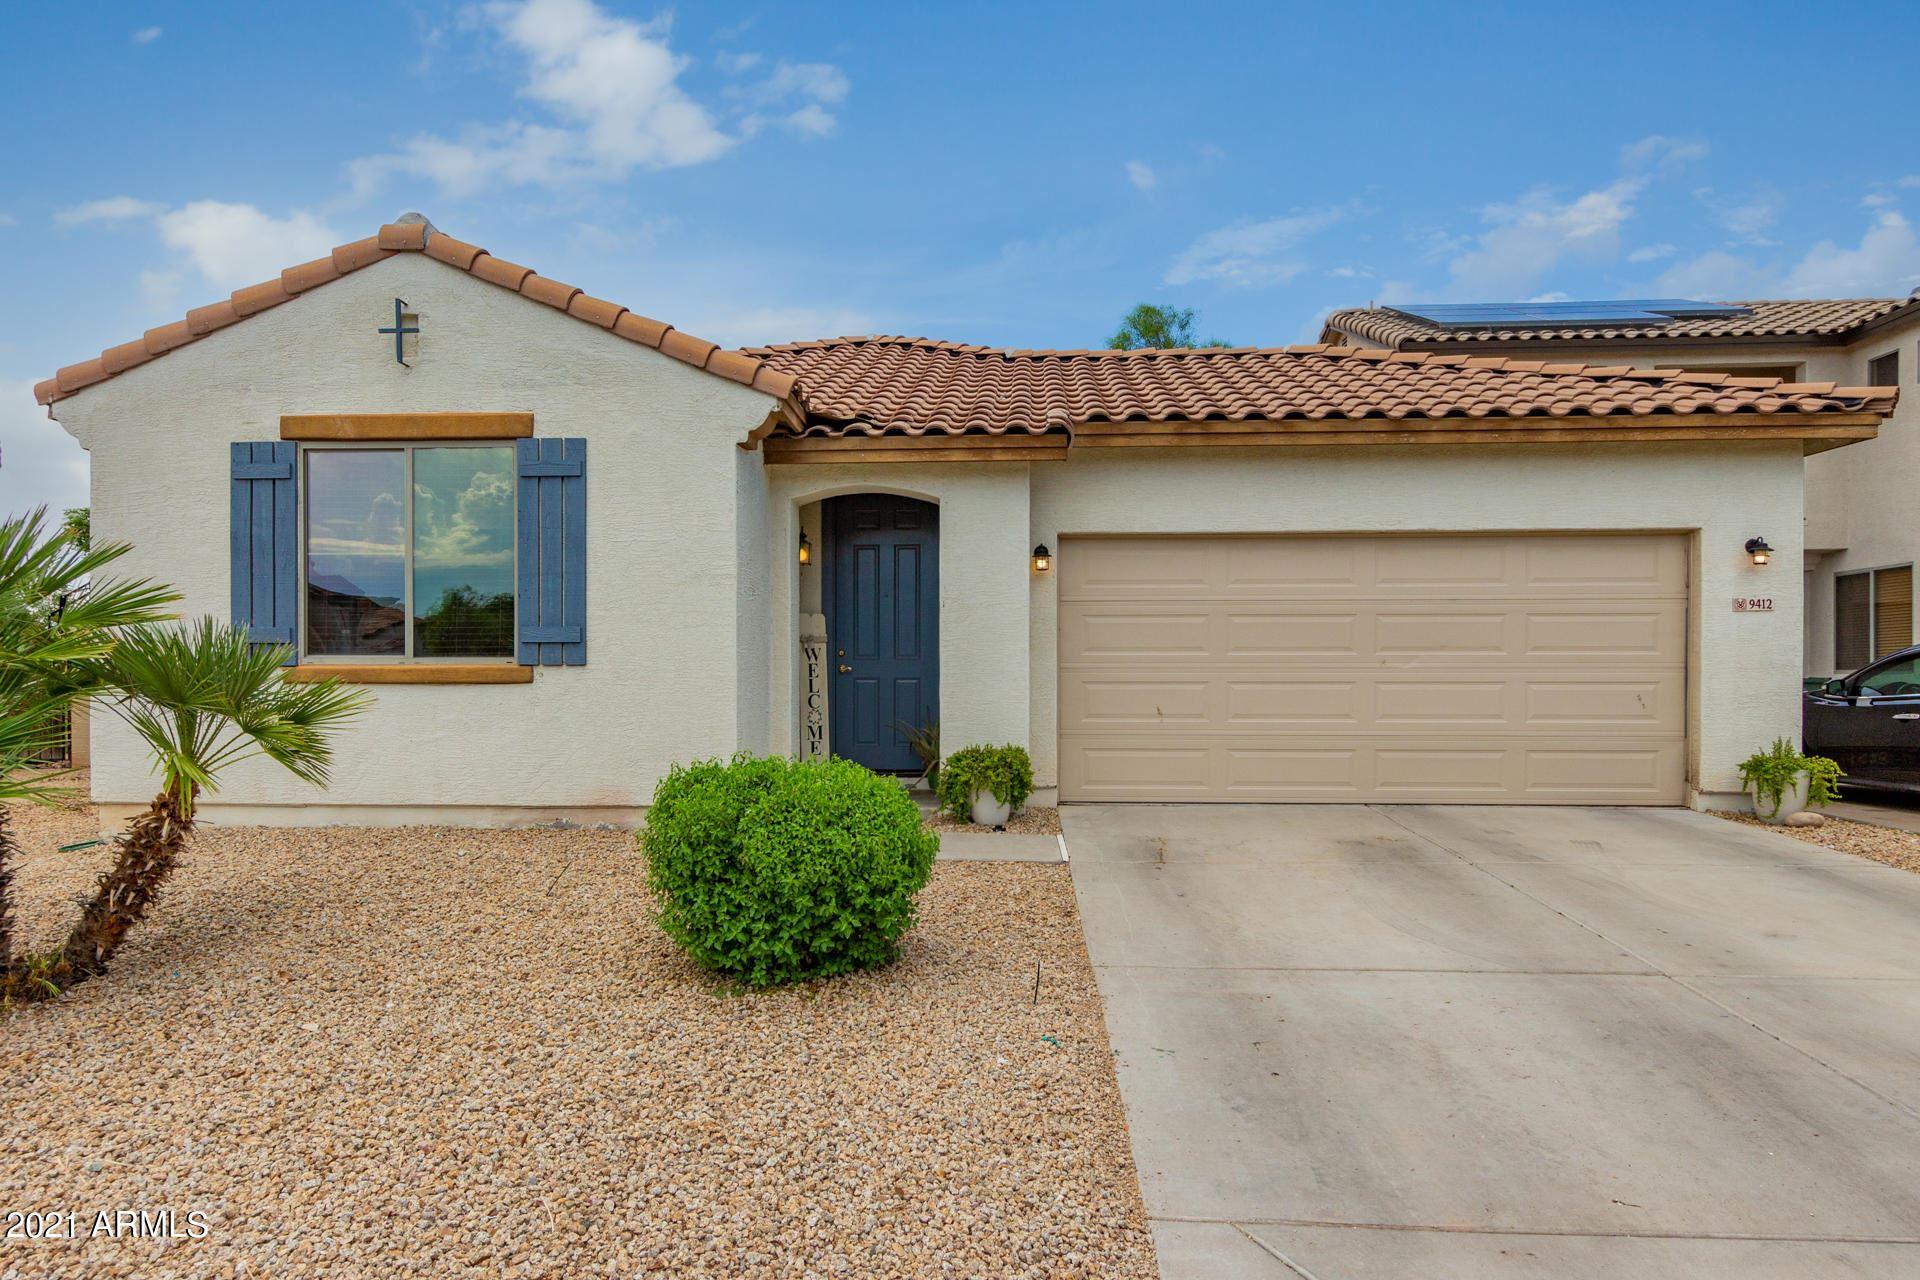 Photo of 9412 W PAYSON Road, Tolleson, AZ 85353 (MLS # 6271899)